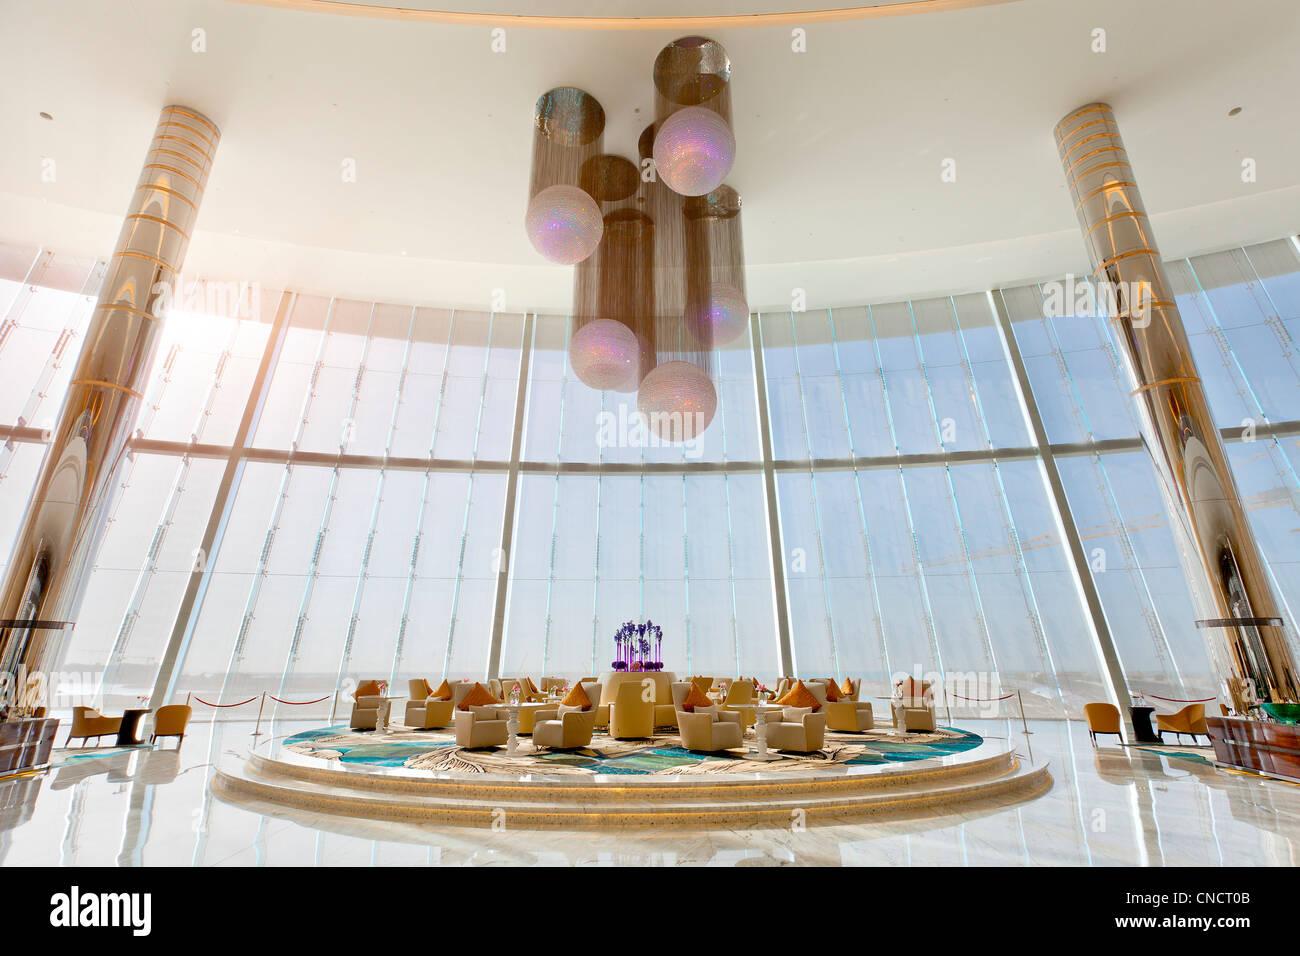 Abu Dhabi, Jumeirah Etihad Towers - Stock Image